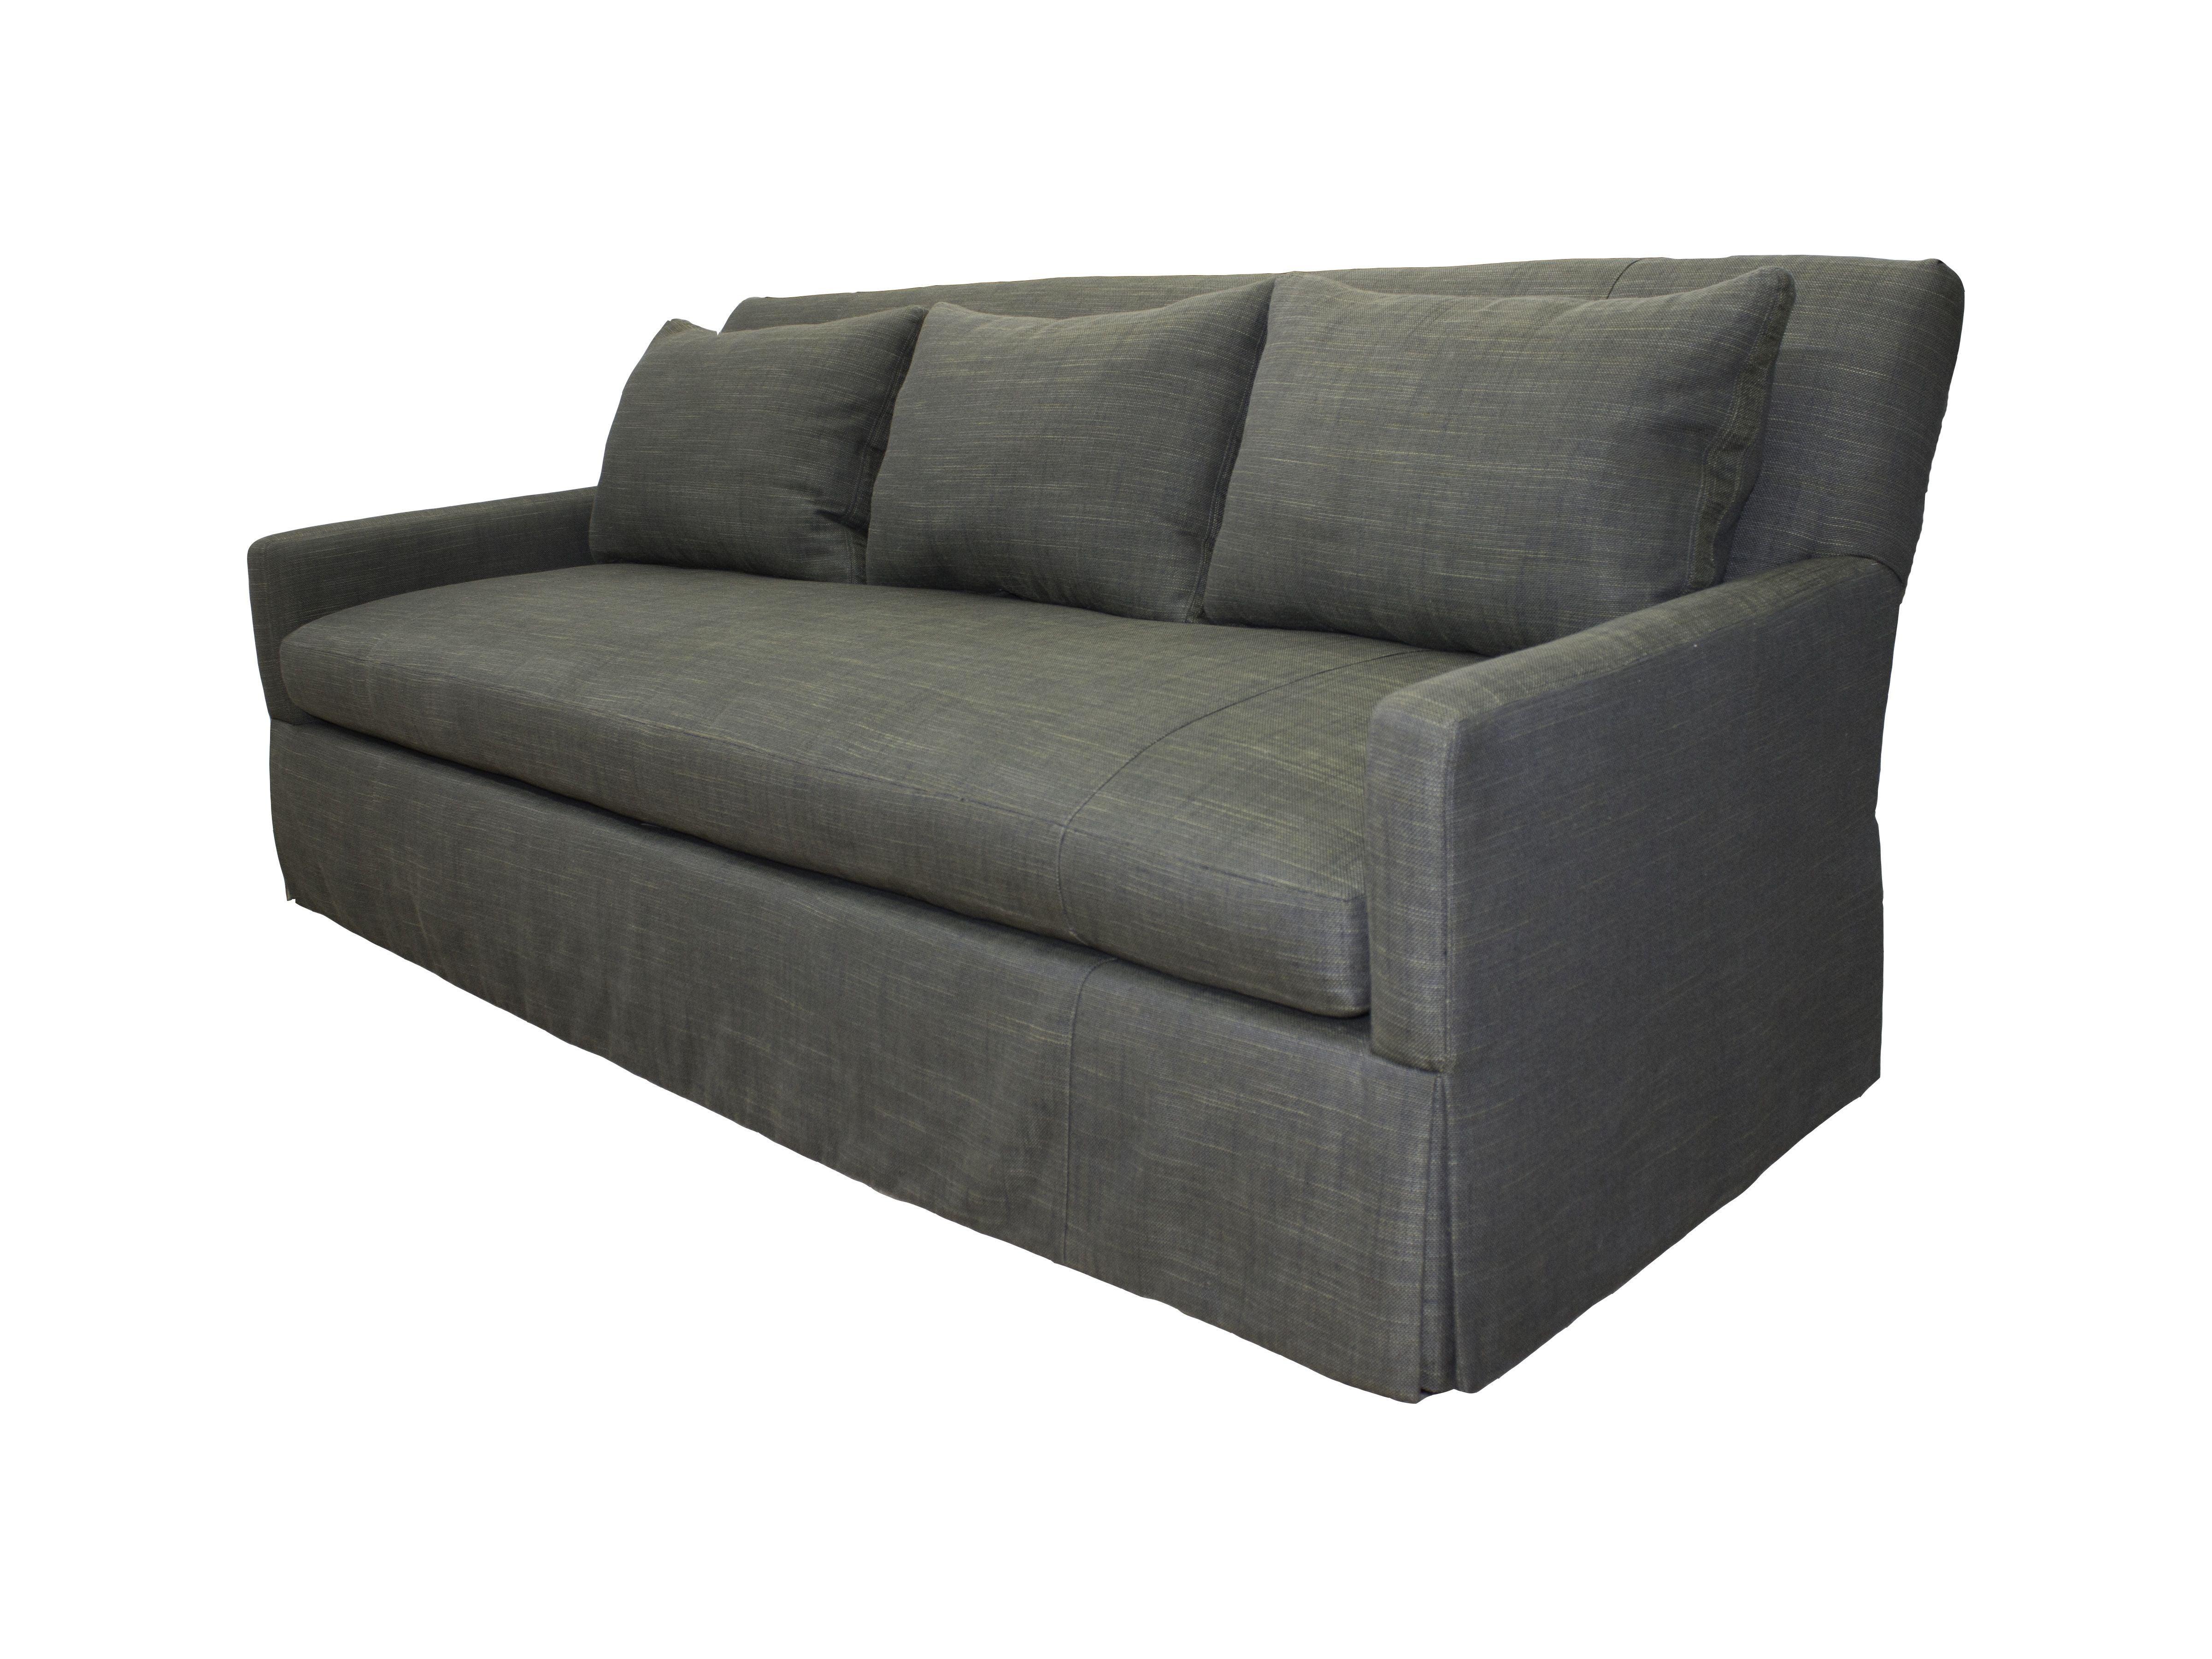 Custom Lee Industries Sofa in Mokum Fabric